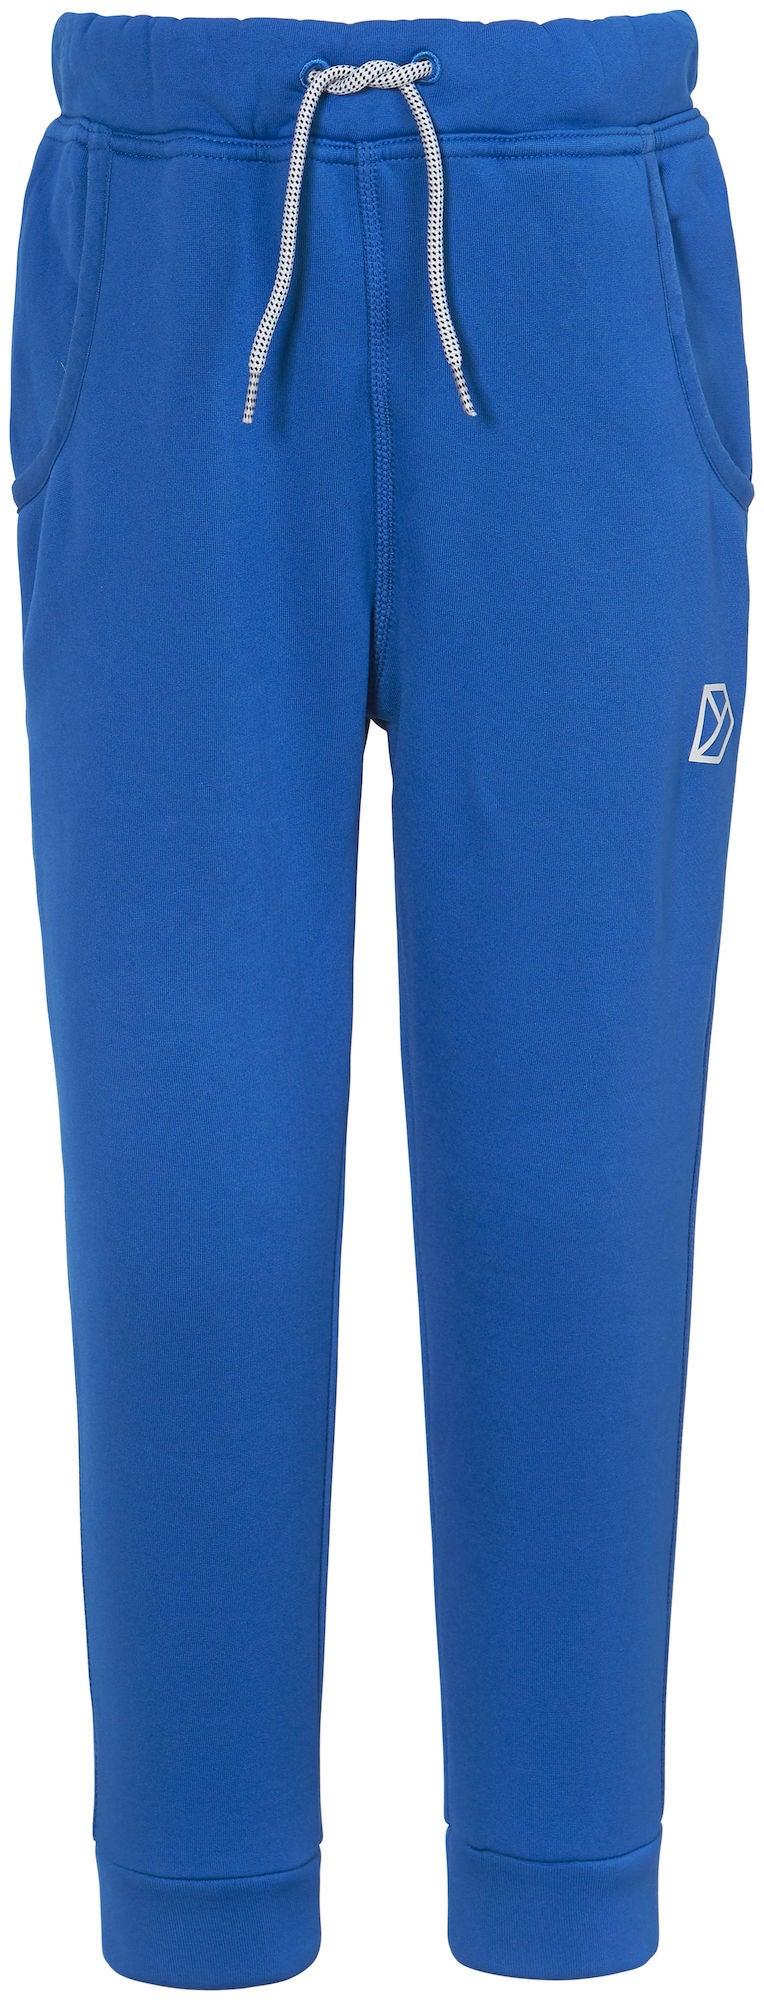 Didriksons Corin Powerstretch Byxa, Classic Blue, 80